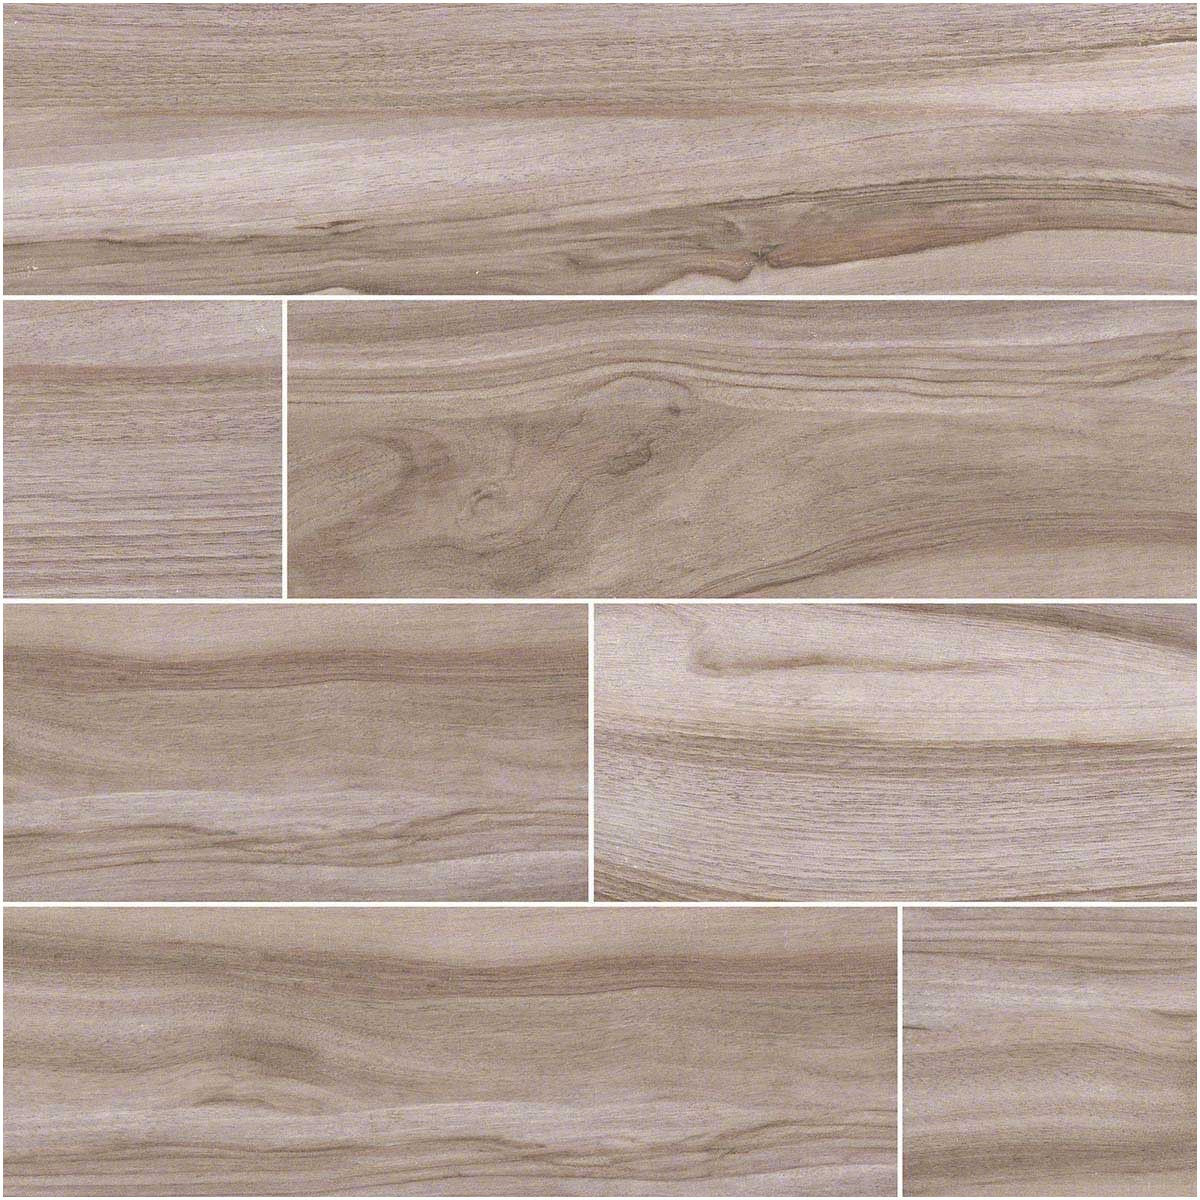 light grey hardwood floors of light wood tile floors wood effect floor tiles amazingpaversfl com throughout wood effect floor tiles od grain tile bathroom wood shower no grout porcelain pros and cons